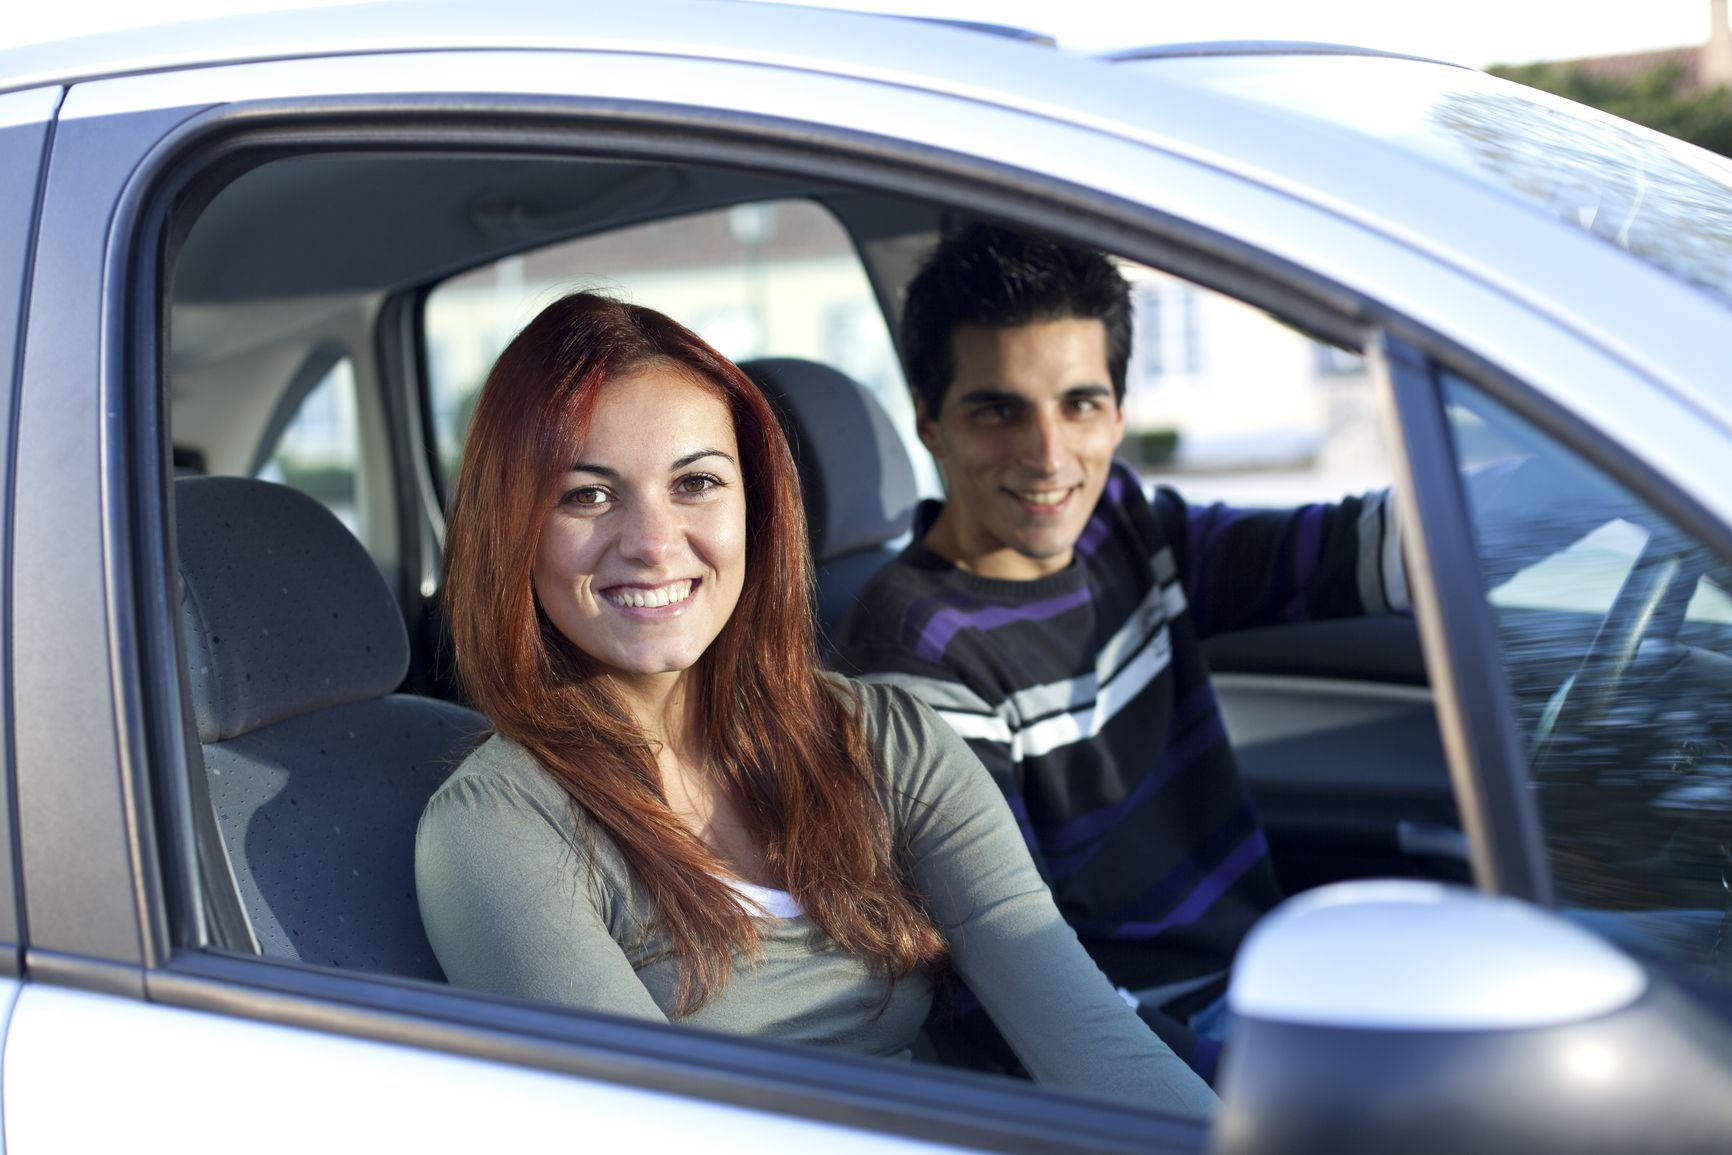 Car Insurance Quotes Getting Car Insurance Car Insurance